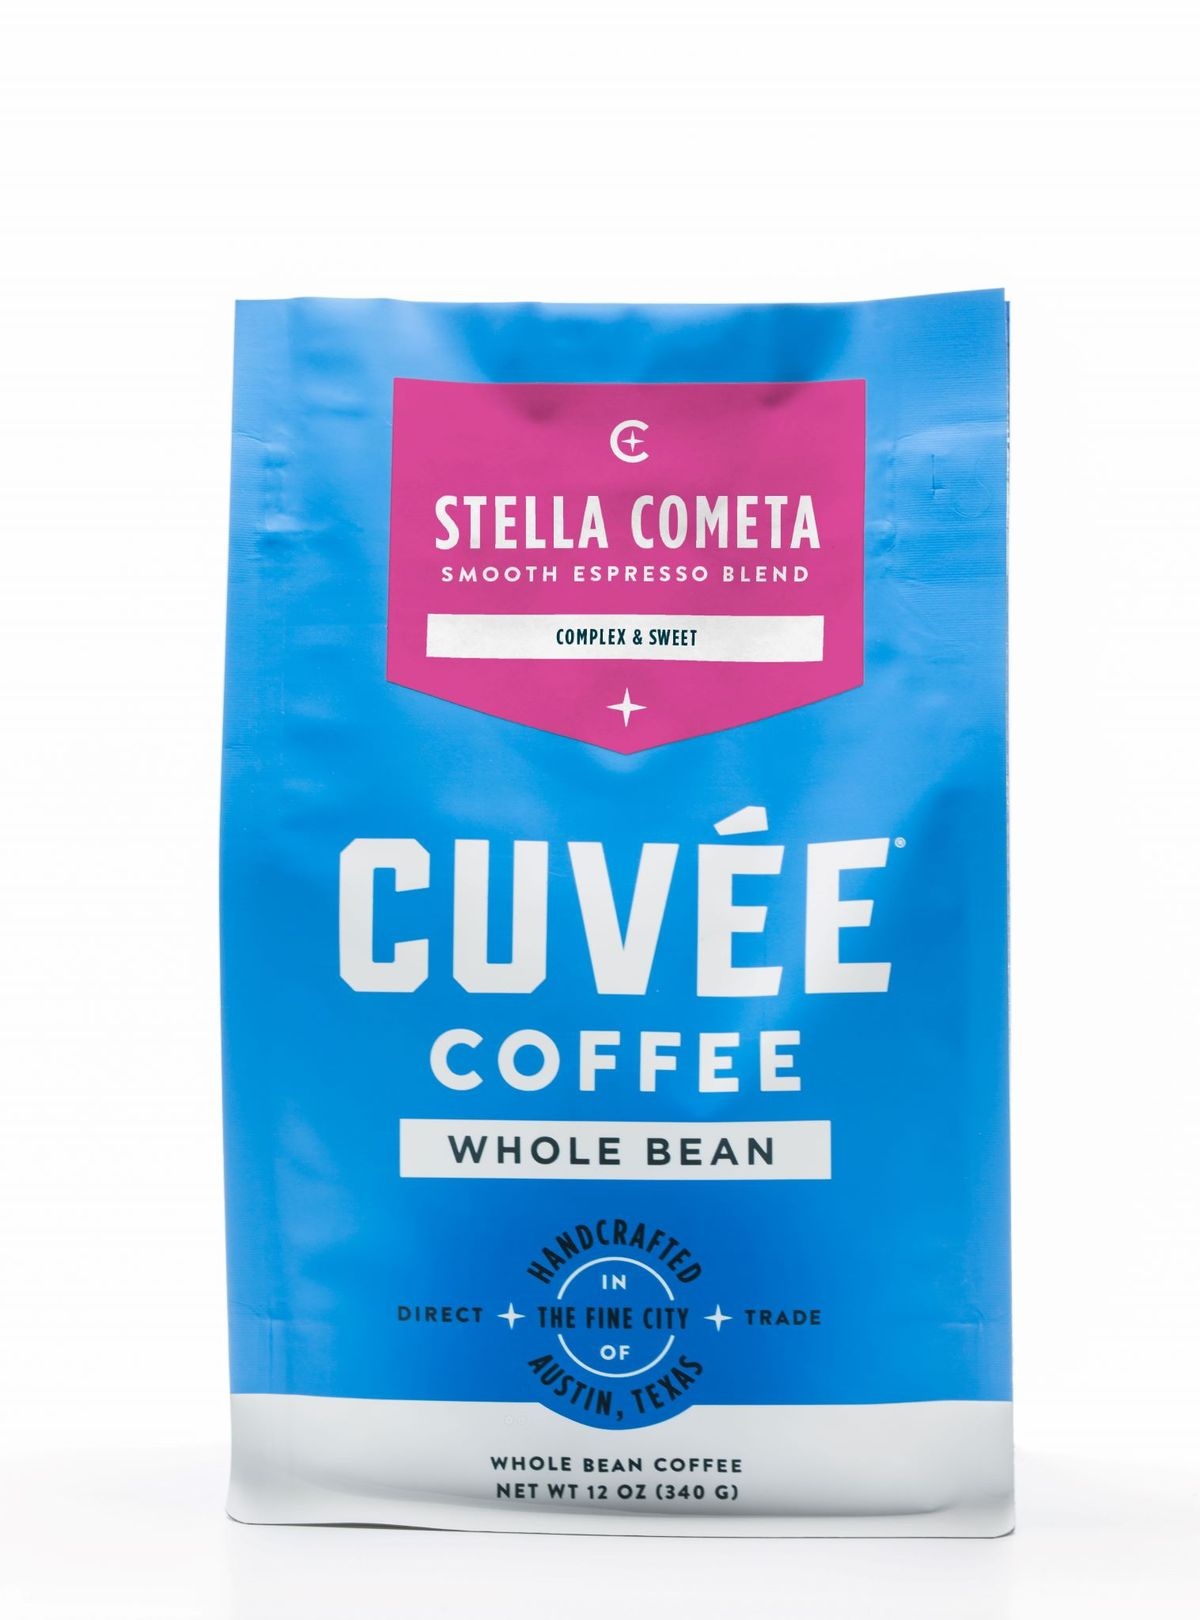 Cuvée Coffee photo